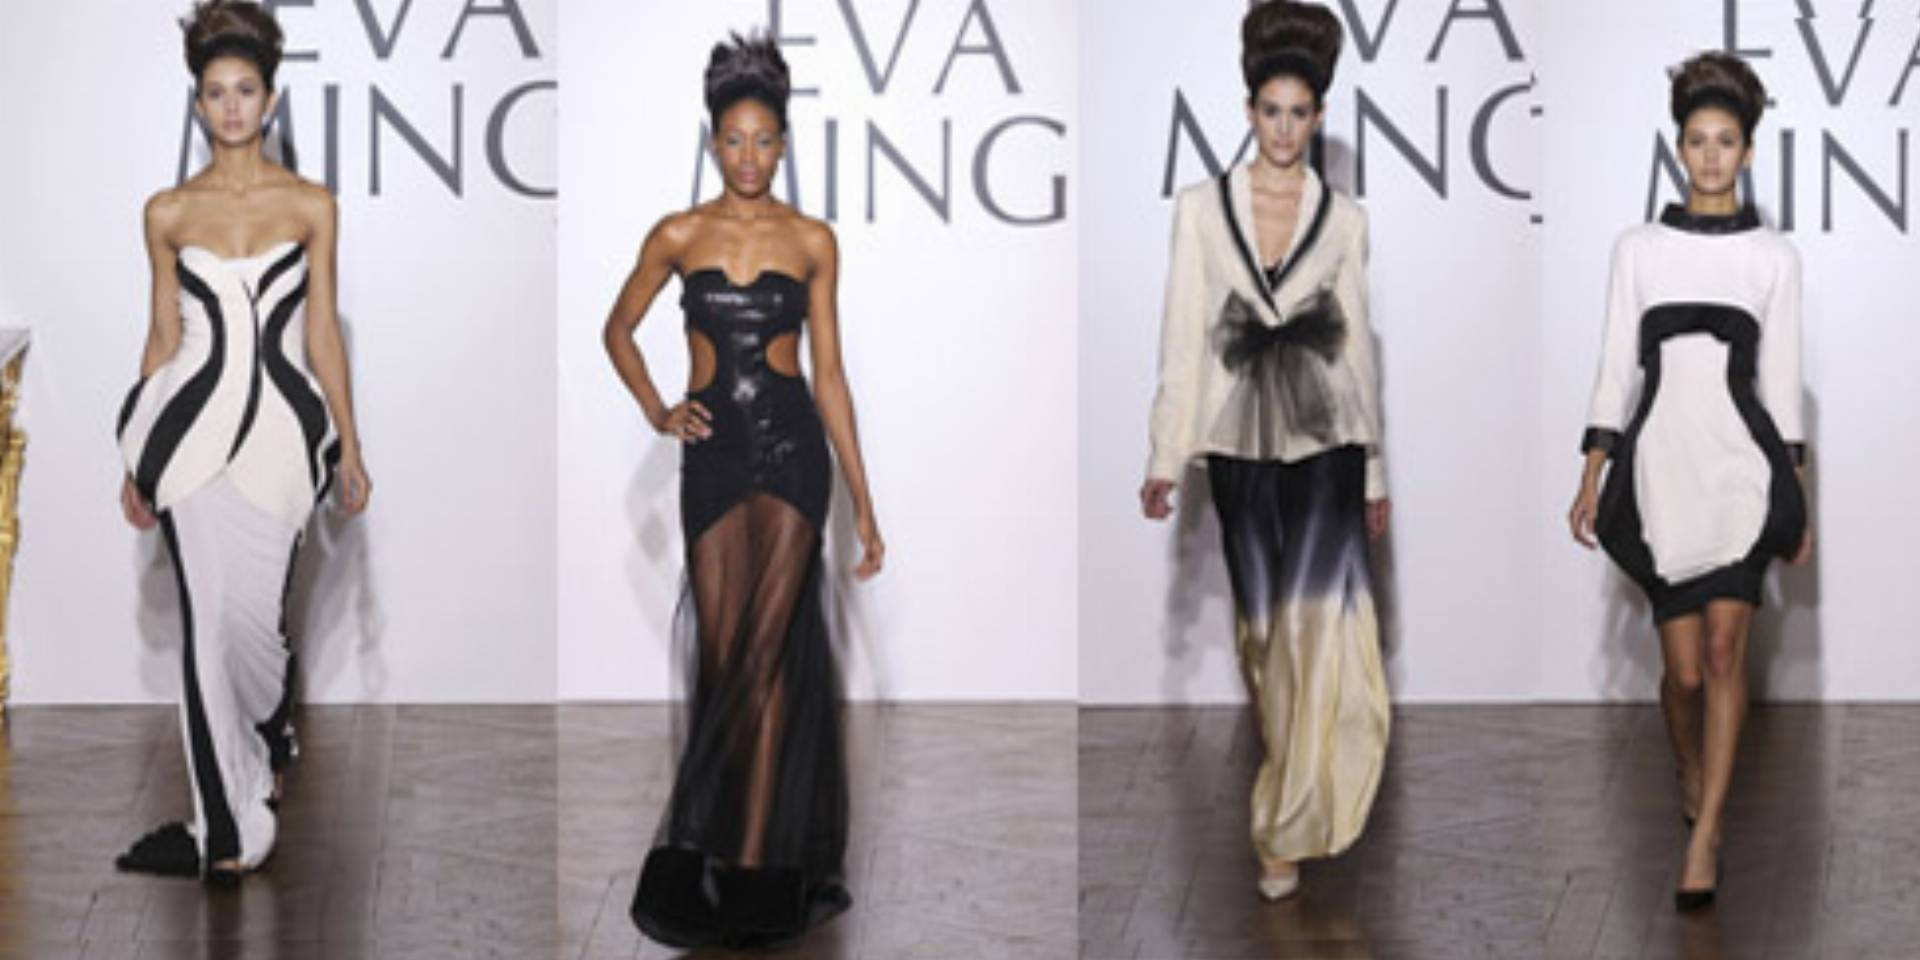 kolekcja Eva Minge wiosna-lato 2012